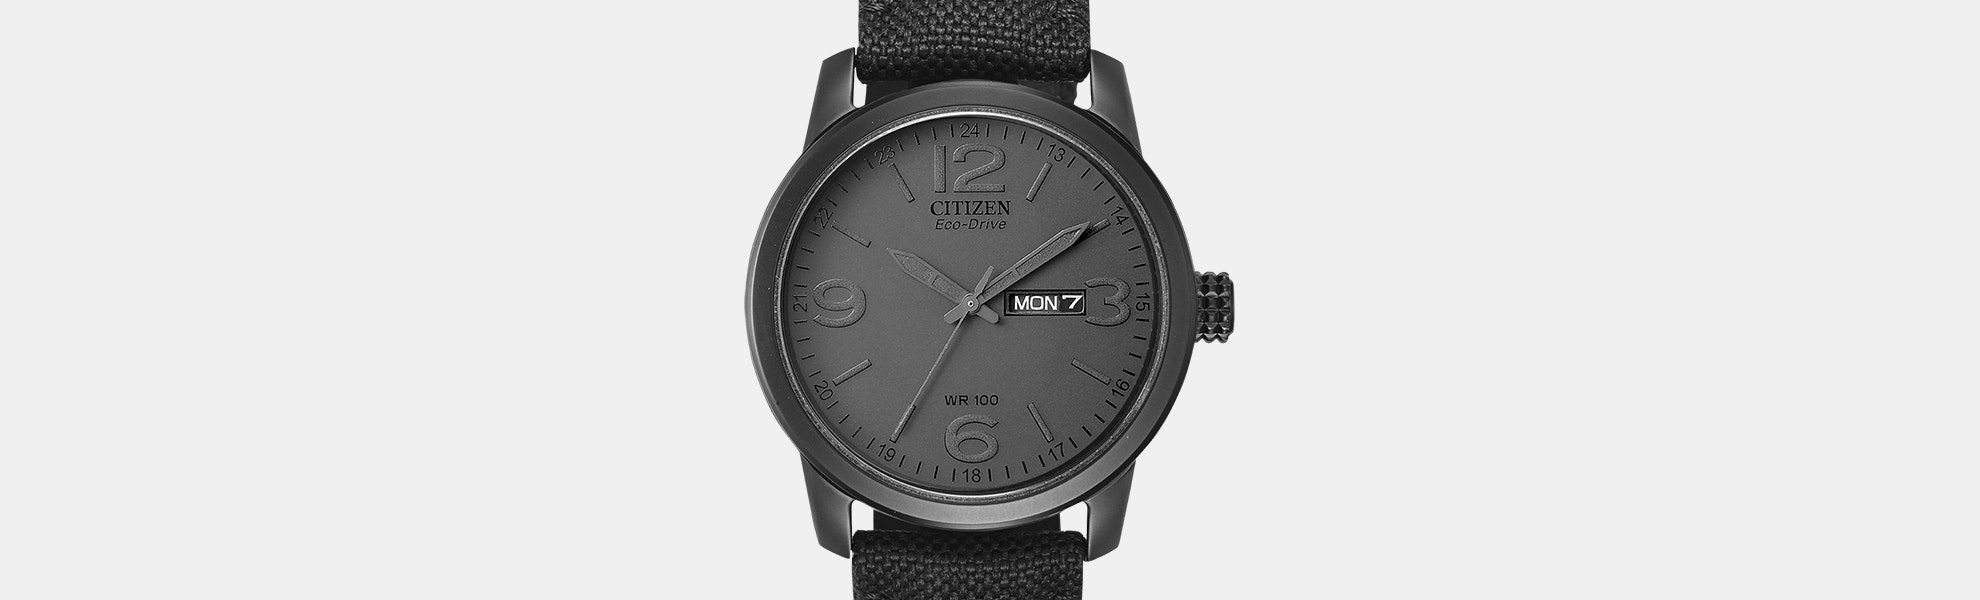 Citizen Chandler BM8475 Eco-Drive Solar Watch